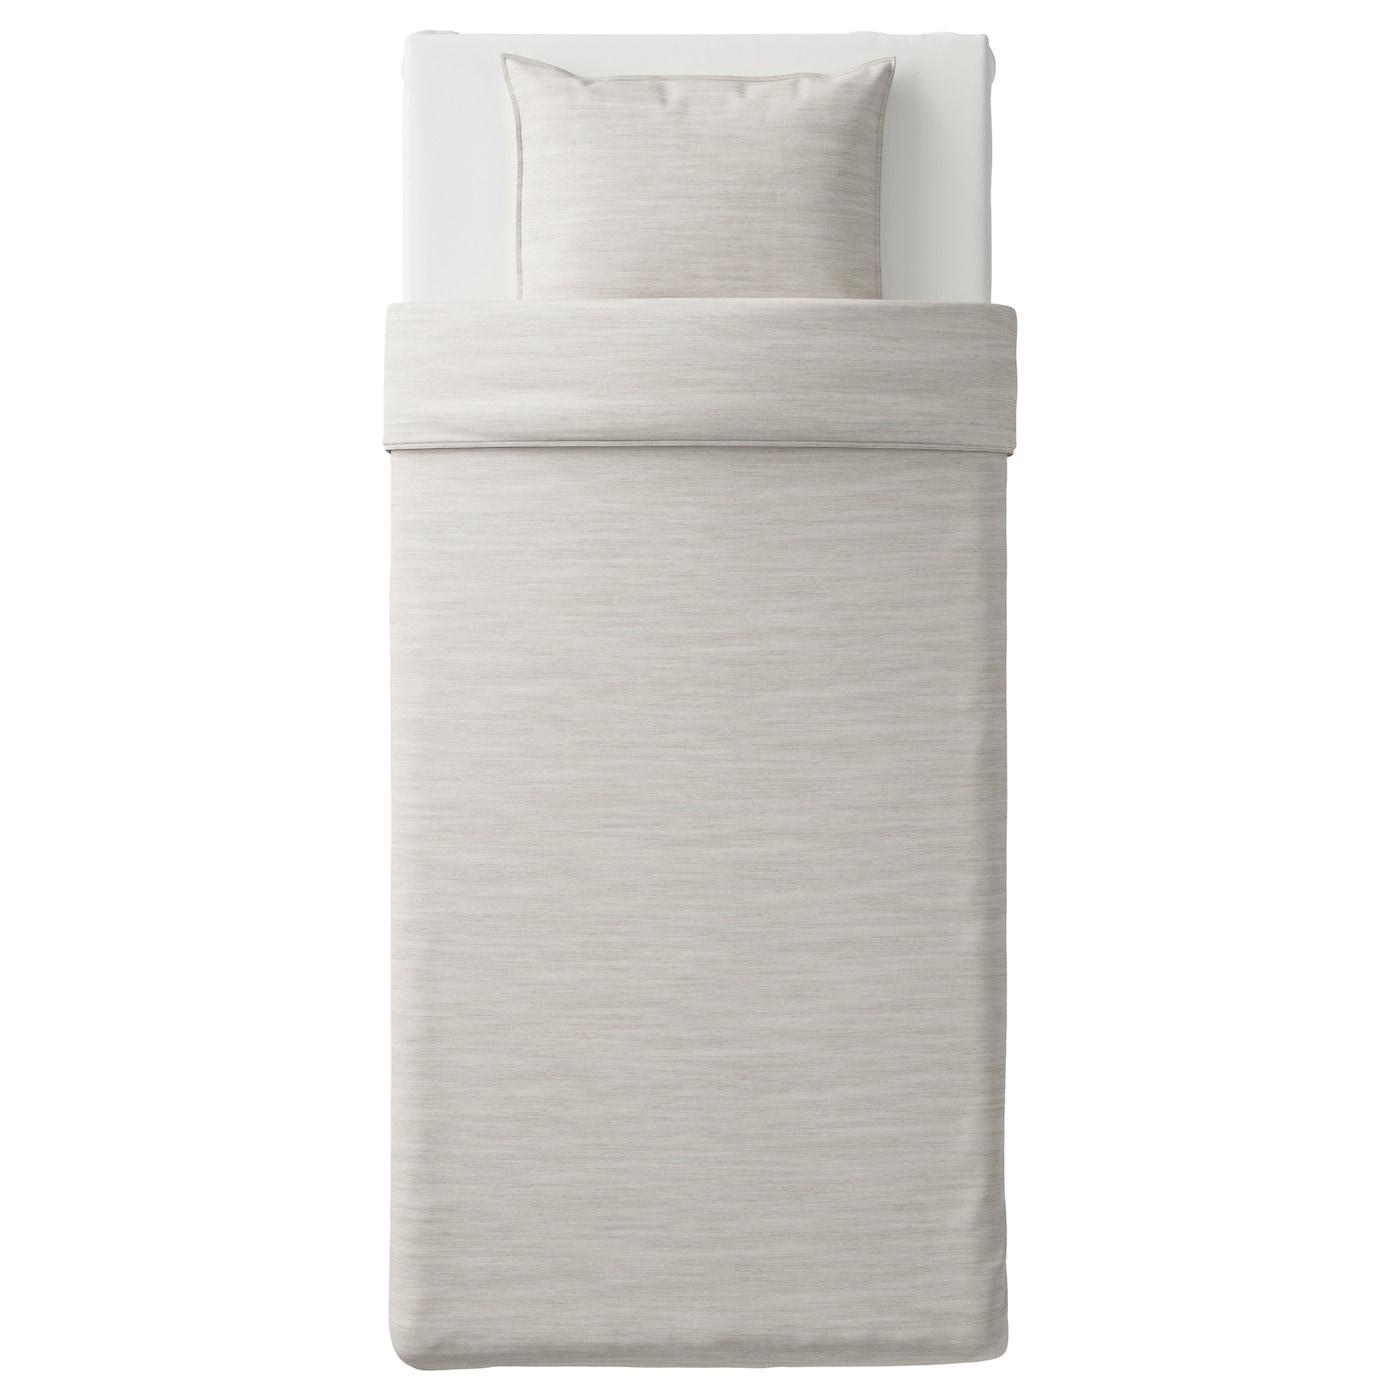 skogsalm housse de couette et taie beige 150 x 200 50 x 60 cm ikea. Black Bedroom Furniture Sets. Home Design Ideas